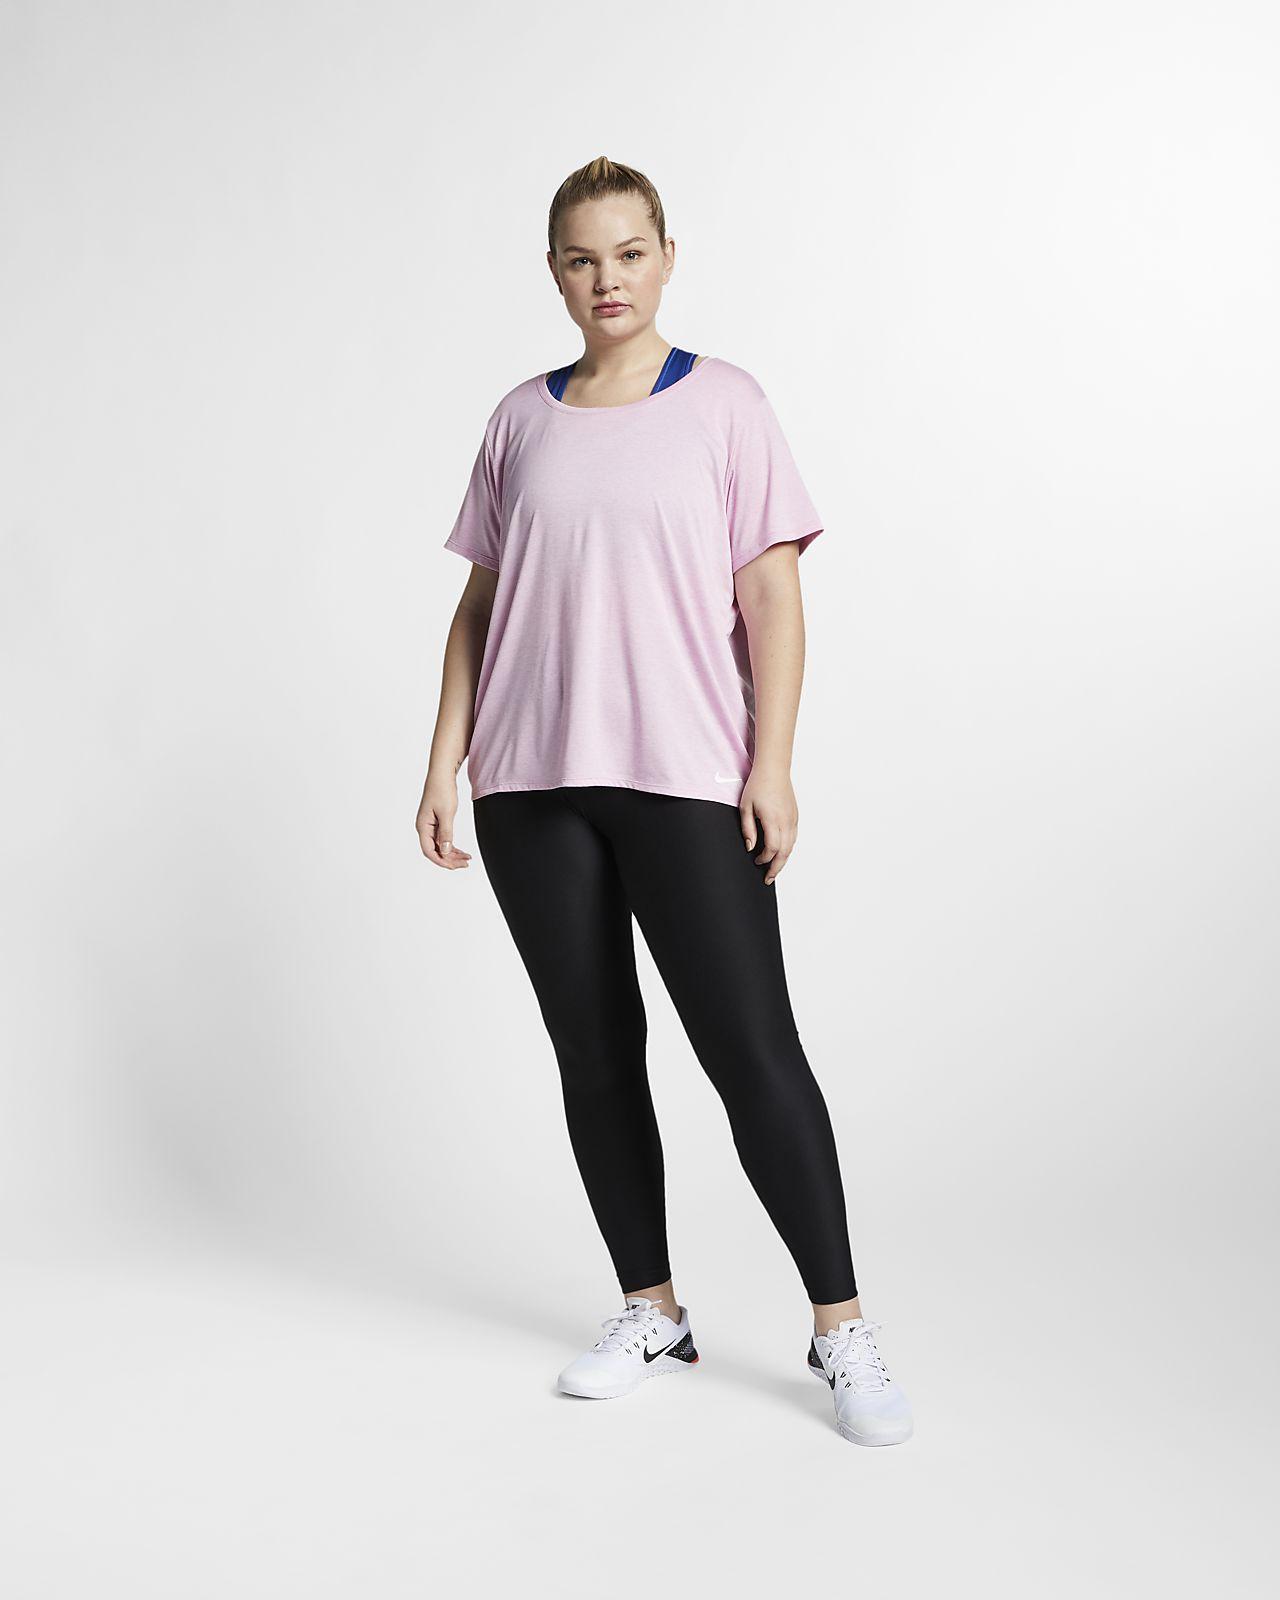 c3da84ab808 ... Nike Dri-FIT Legend Women s Short-Sleeve Training Top (Plus Size)